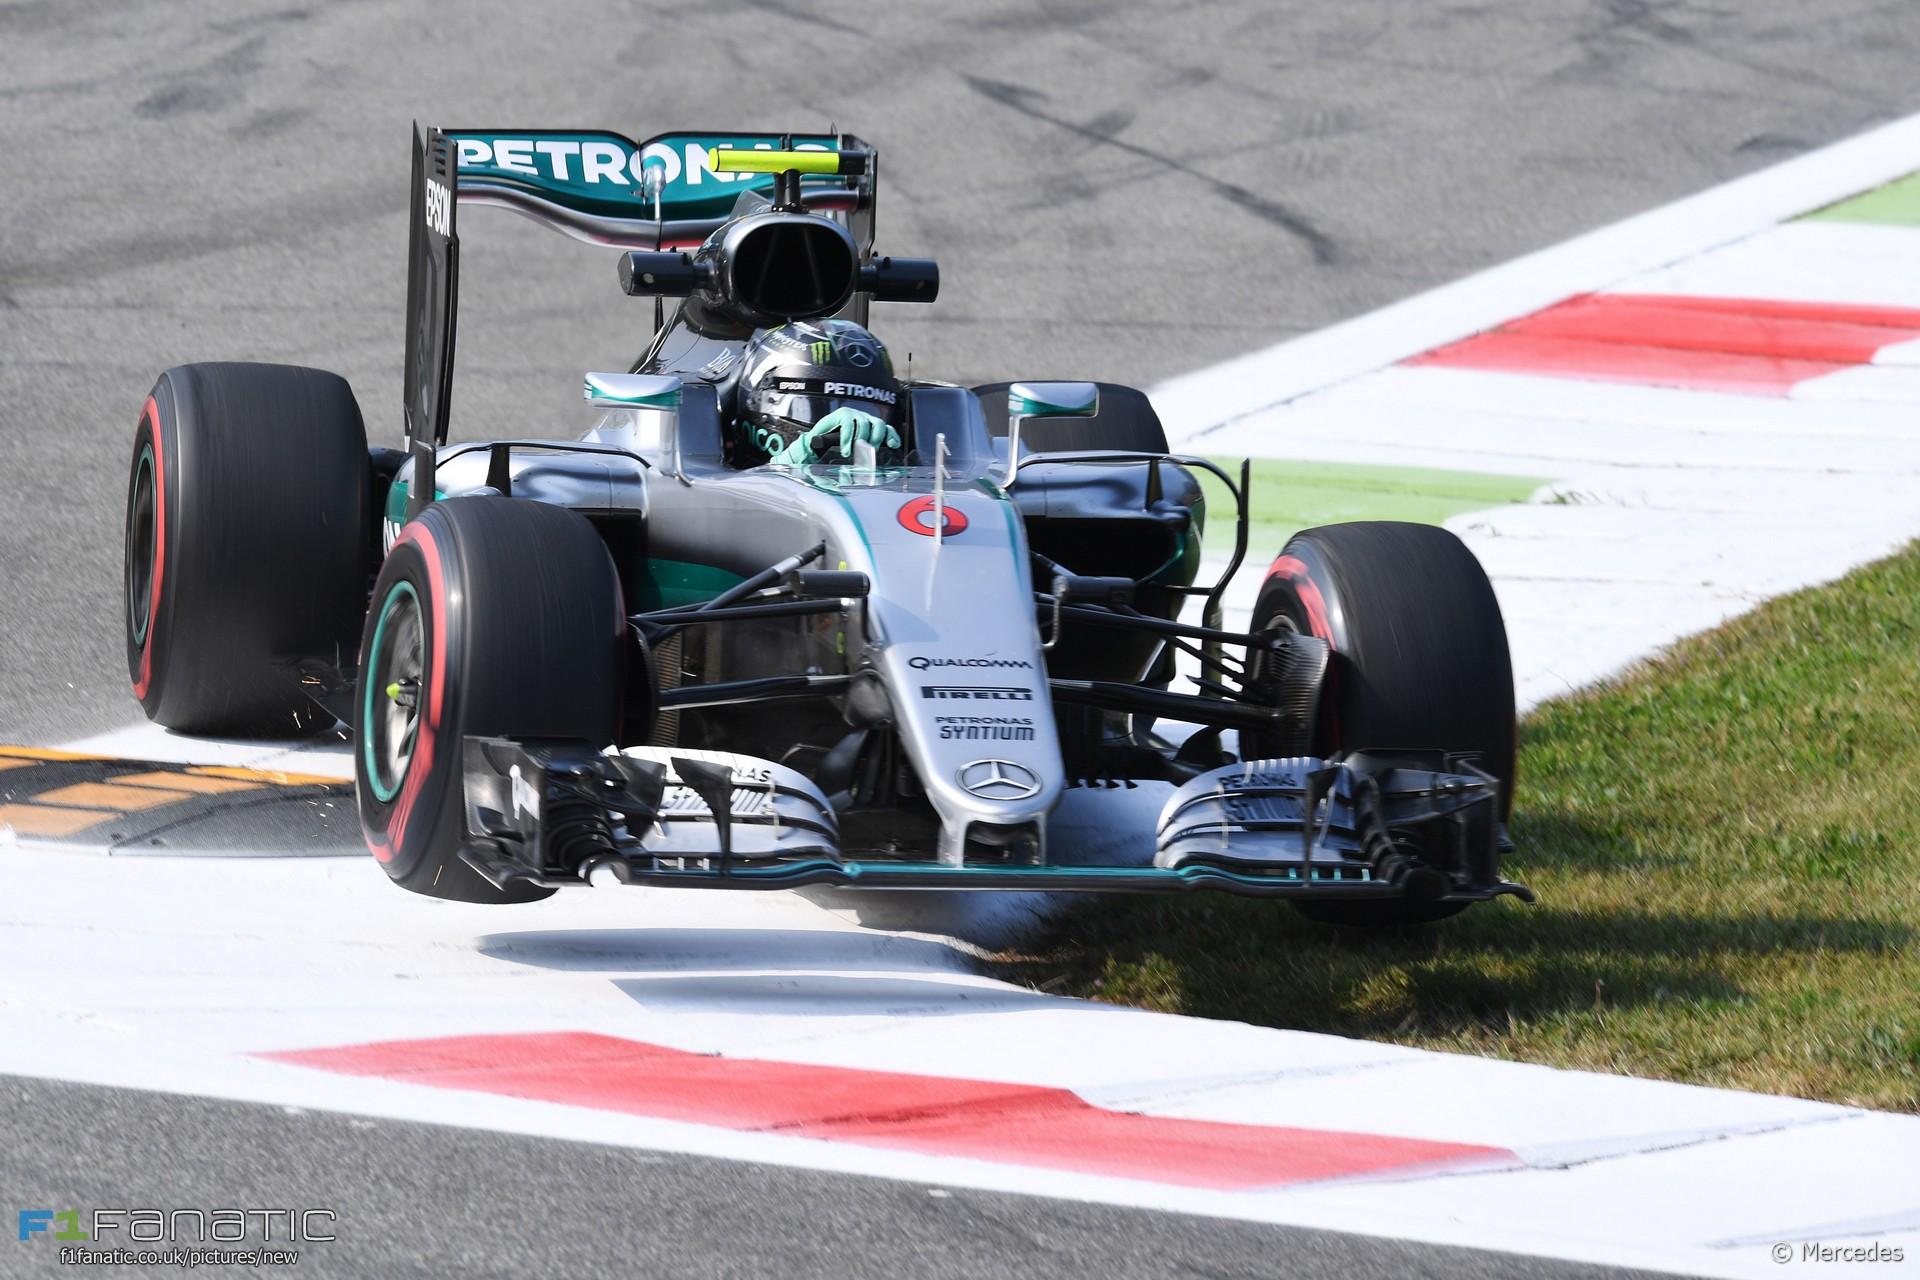 Nico Rosberg, Mercedes, Monza, 2016